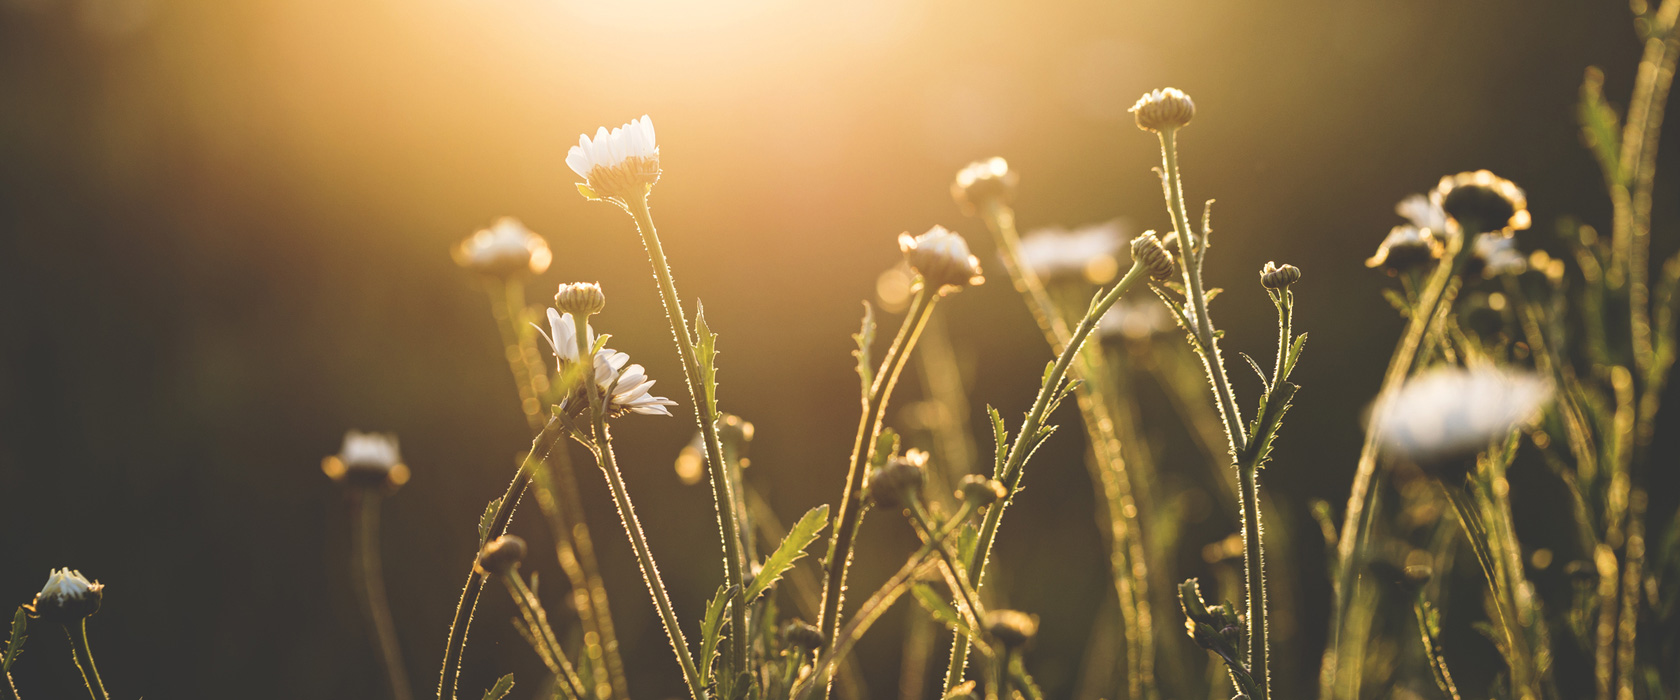 Magic hour Flowers